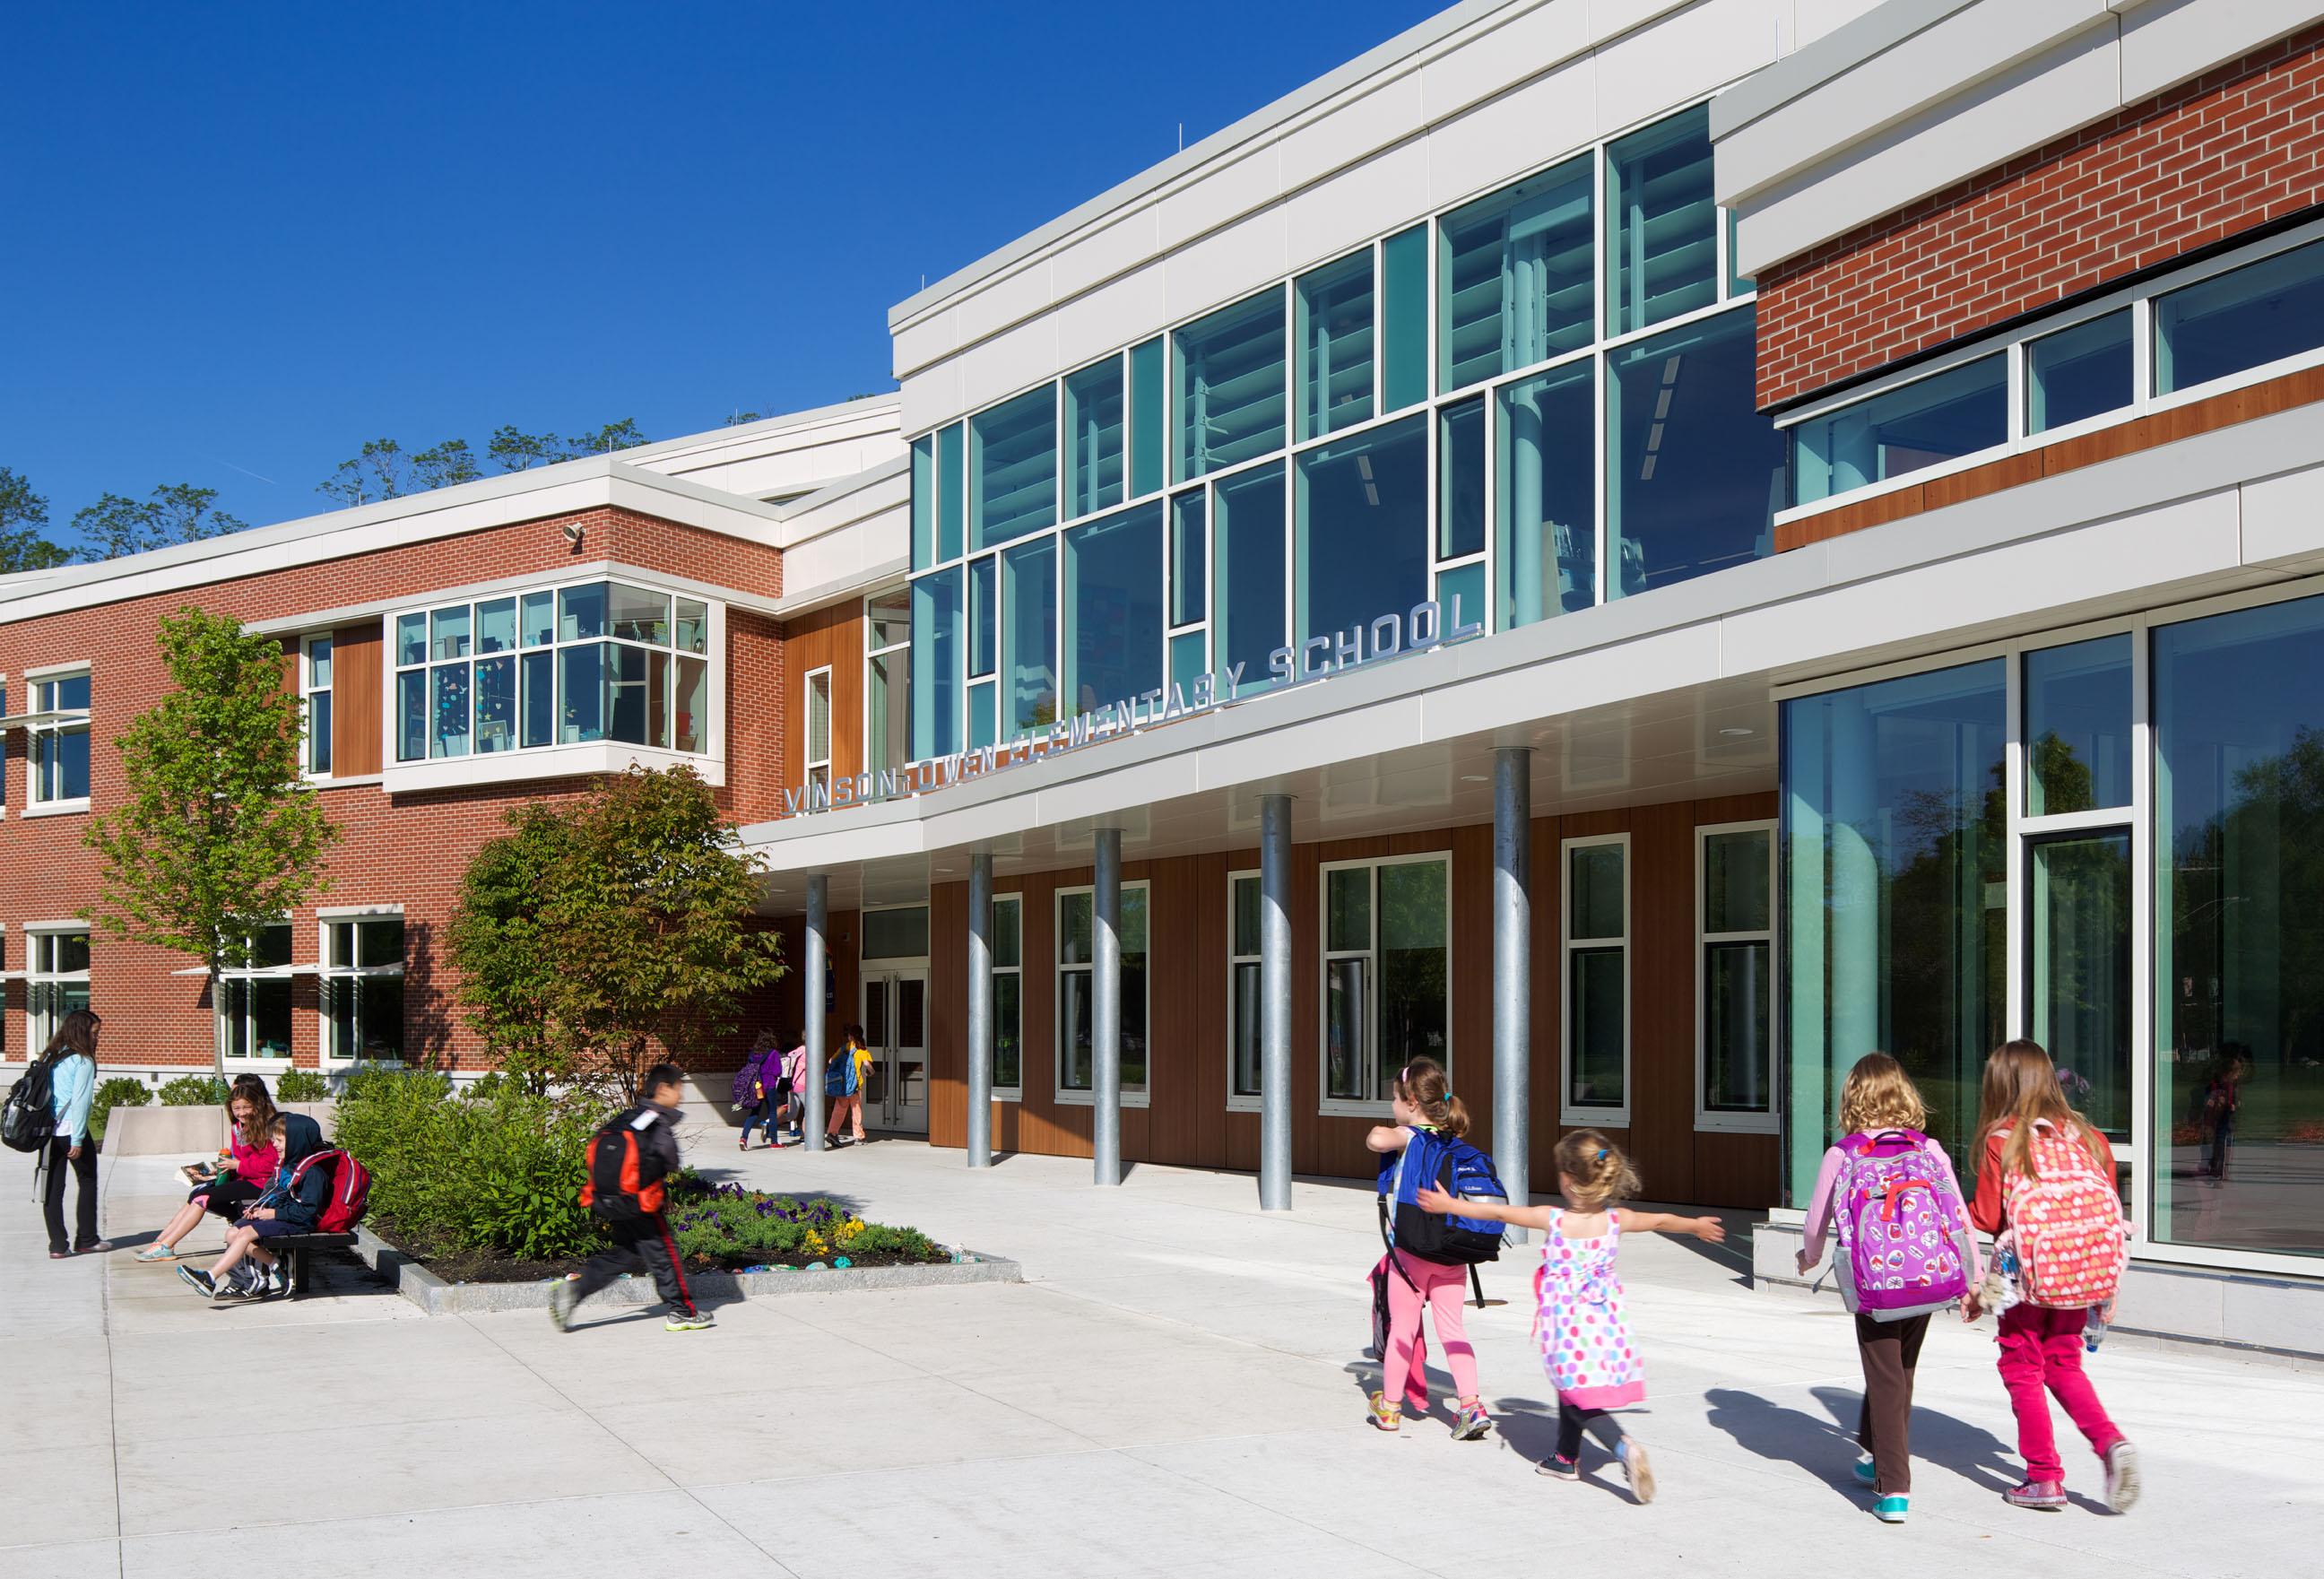 Vinson Owen Elementary School